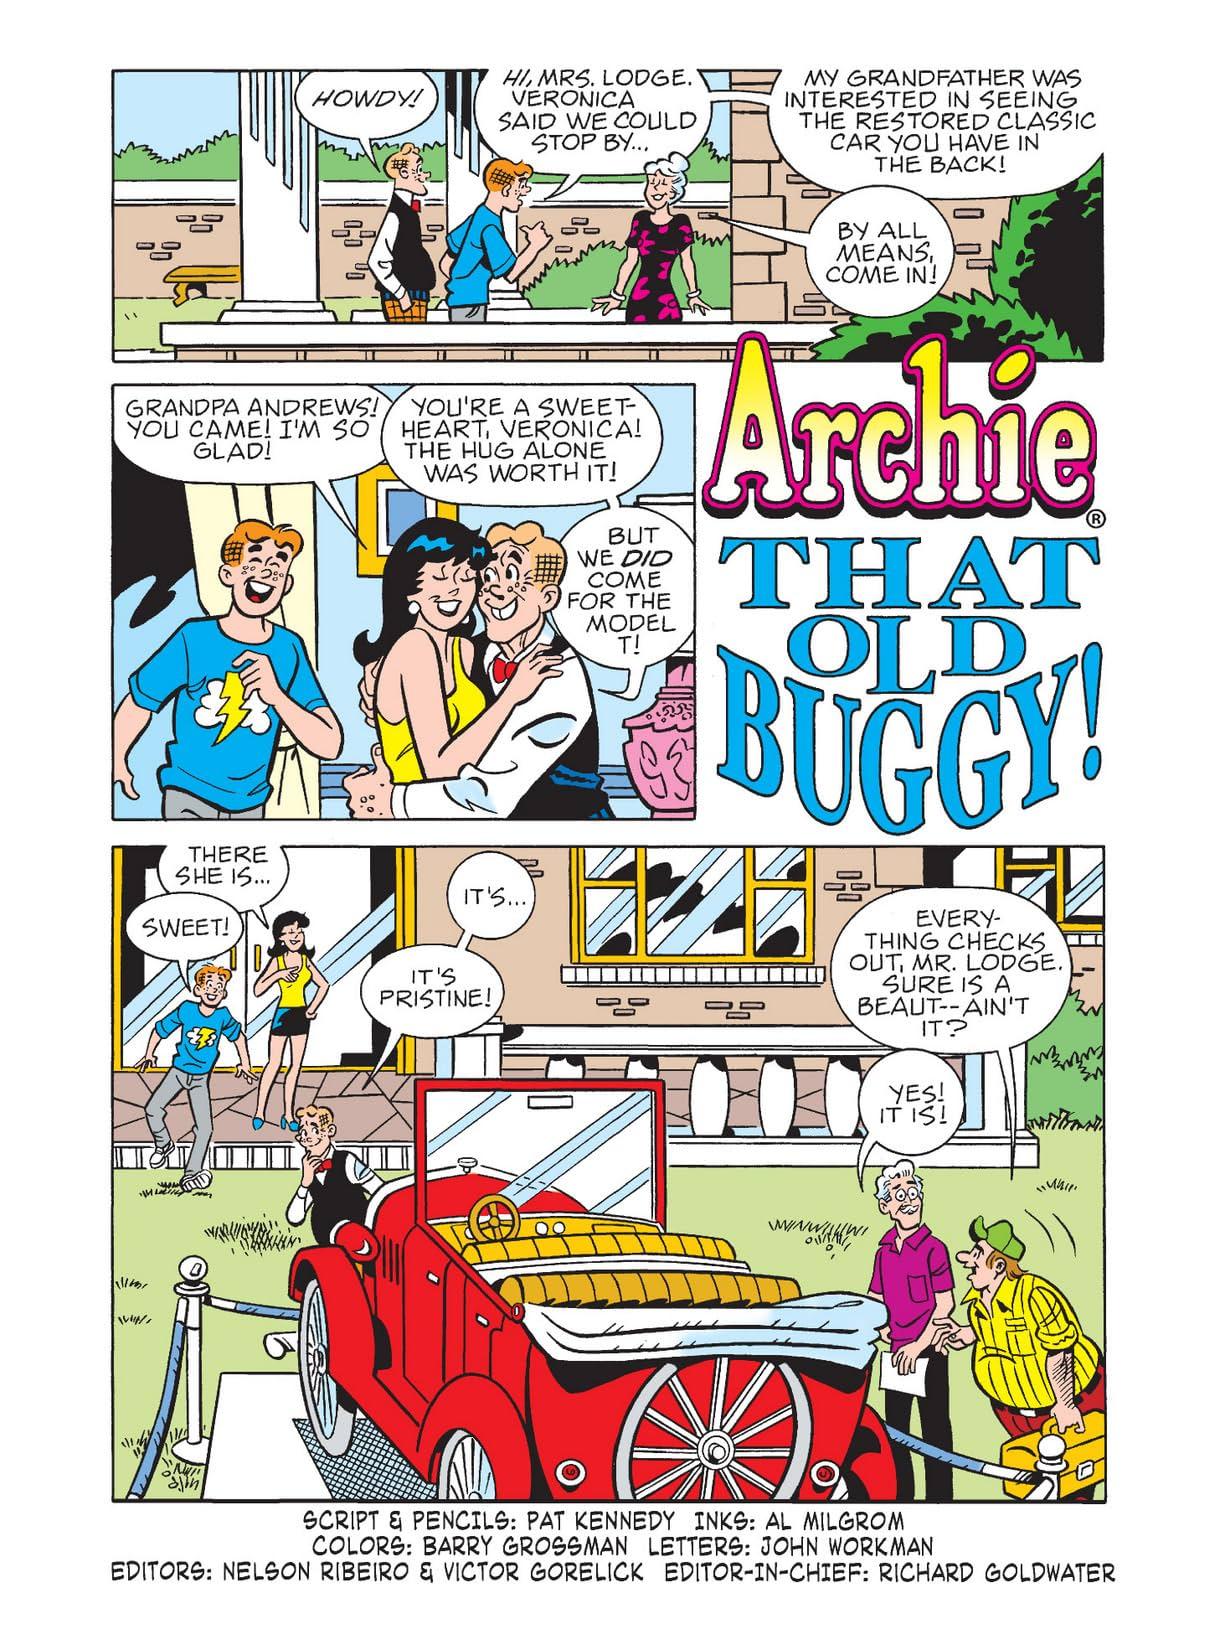 Archie Digest #239